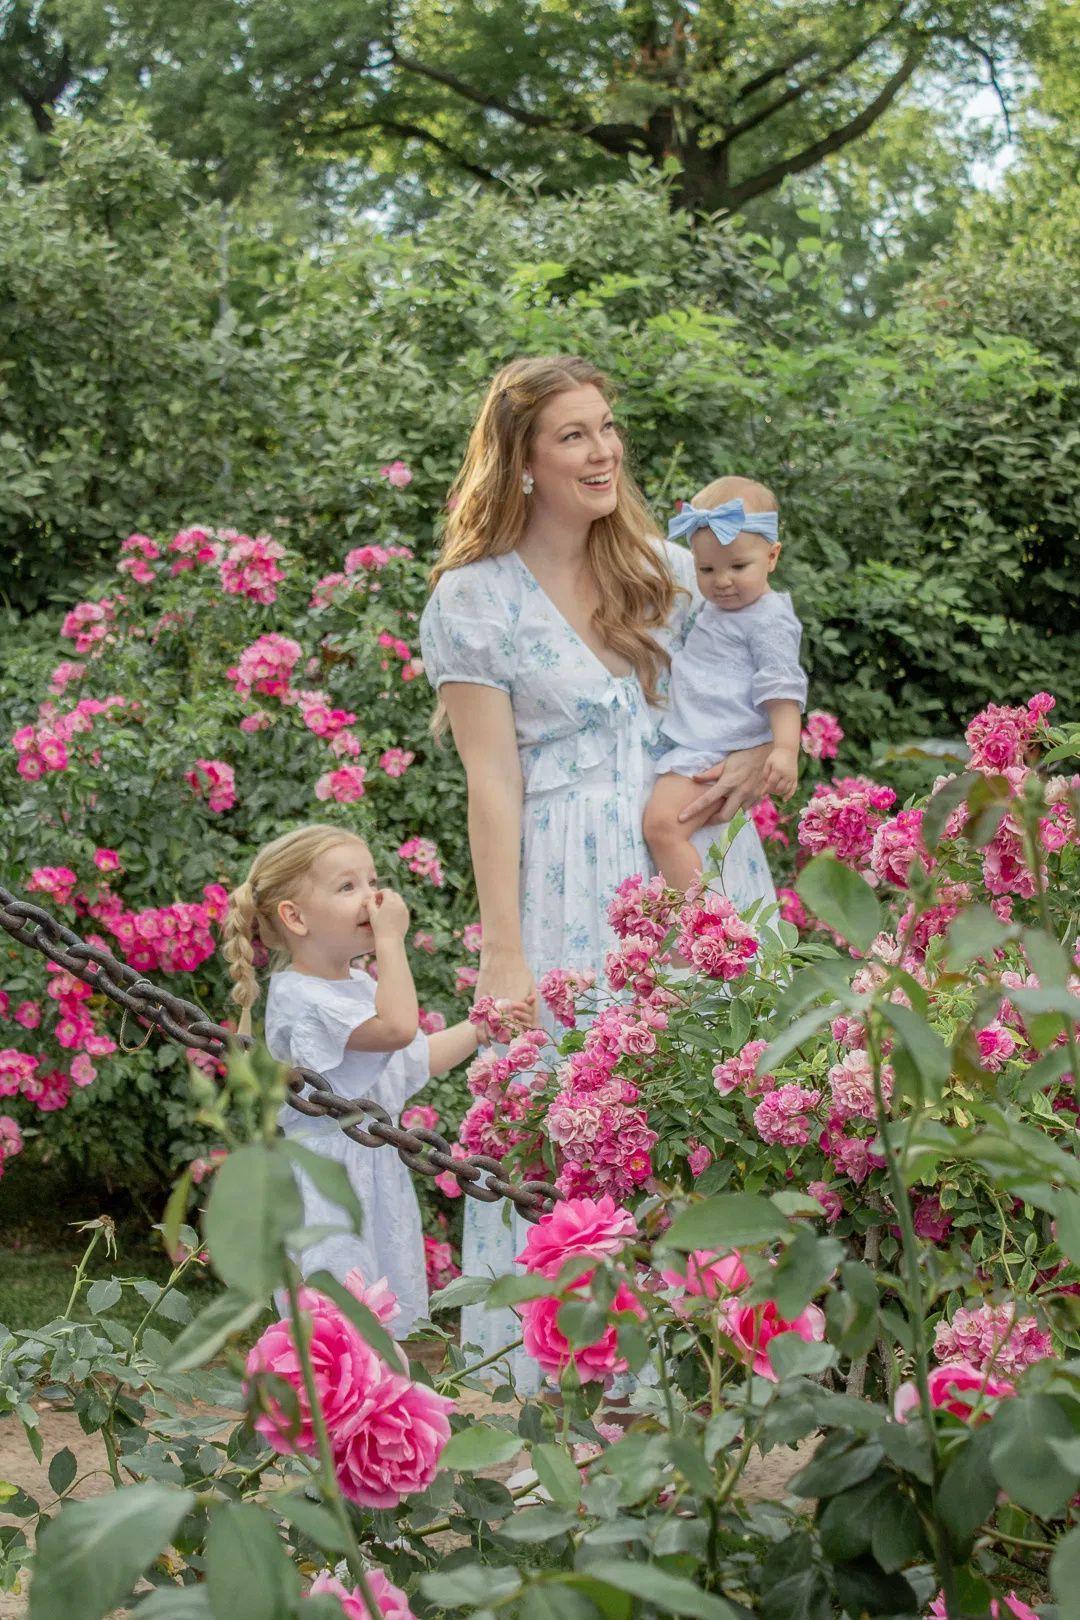 Kansas City Rose Garden Roses Gardens Photoshoot Locations Midwest Flower Field Flowers Flower Park Manicured Garden Pink